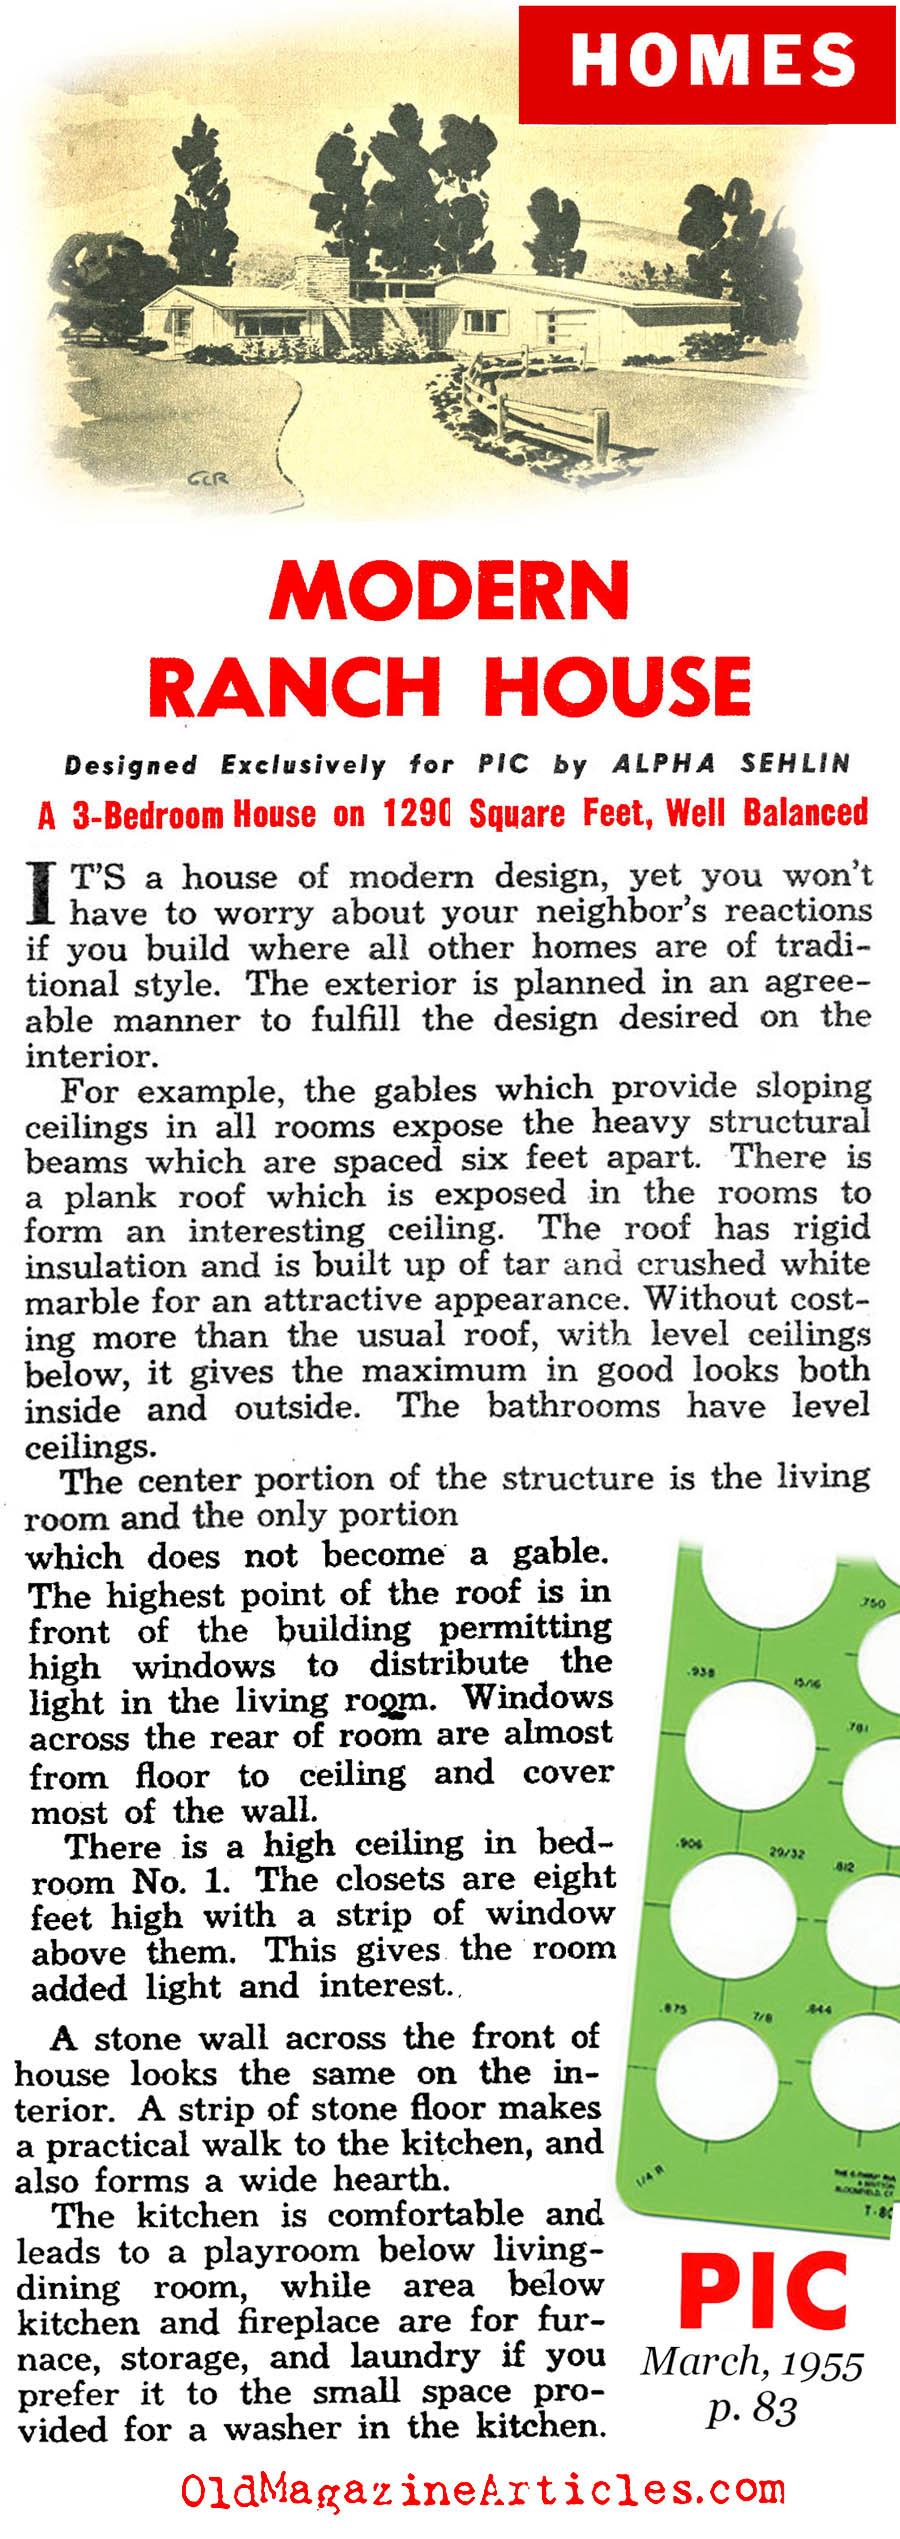 ranch house magazine article 1950s american taste magazine article building the suburban dream pic magazine 1955